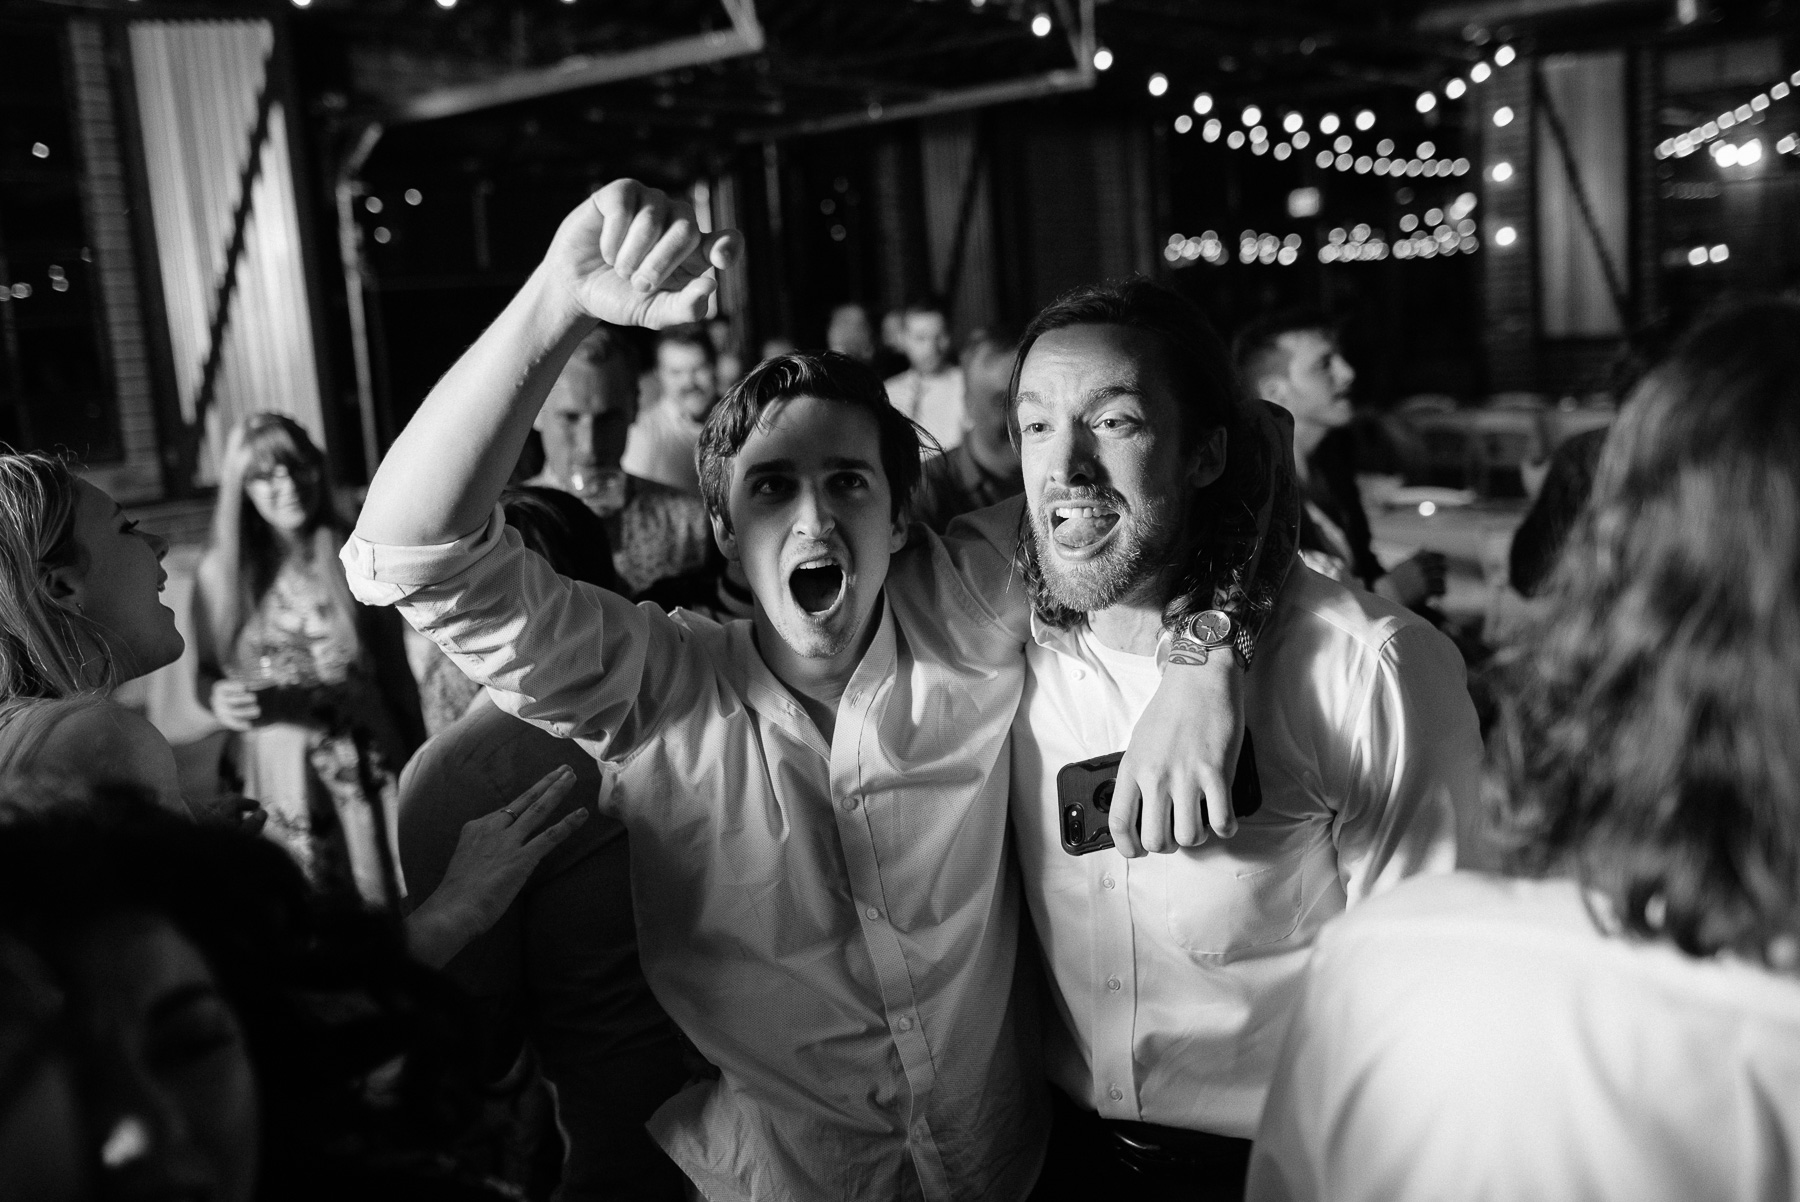 enowen-wedding-photography-mike-anna-suffolk-punch-charlotte (70 of 78).jpg